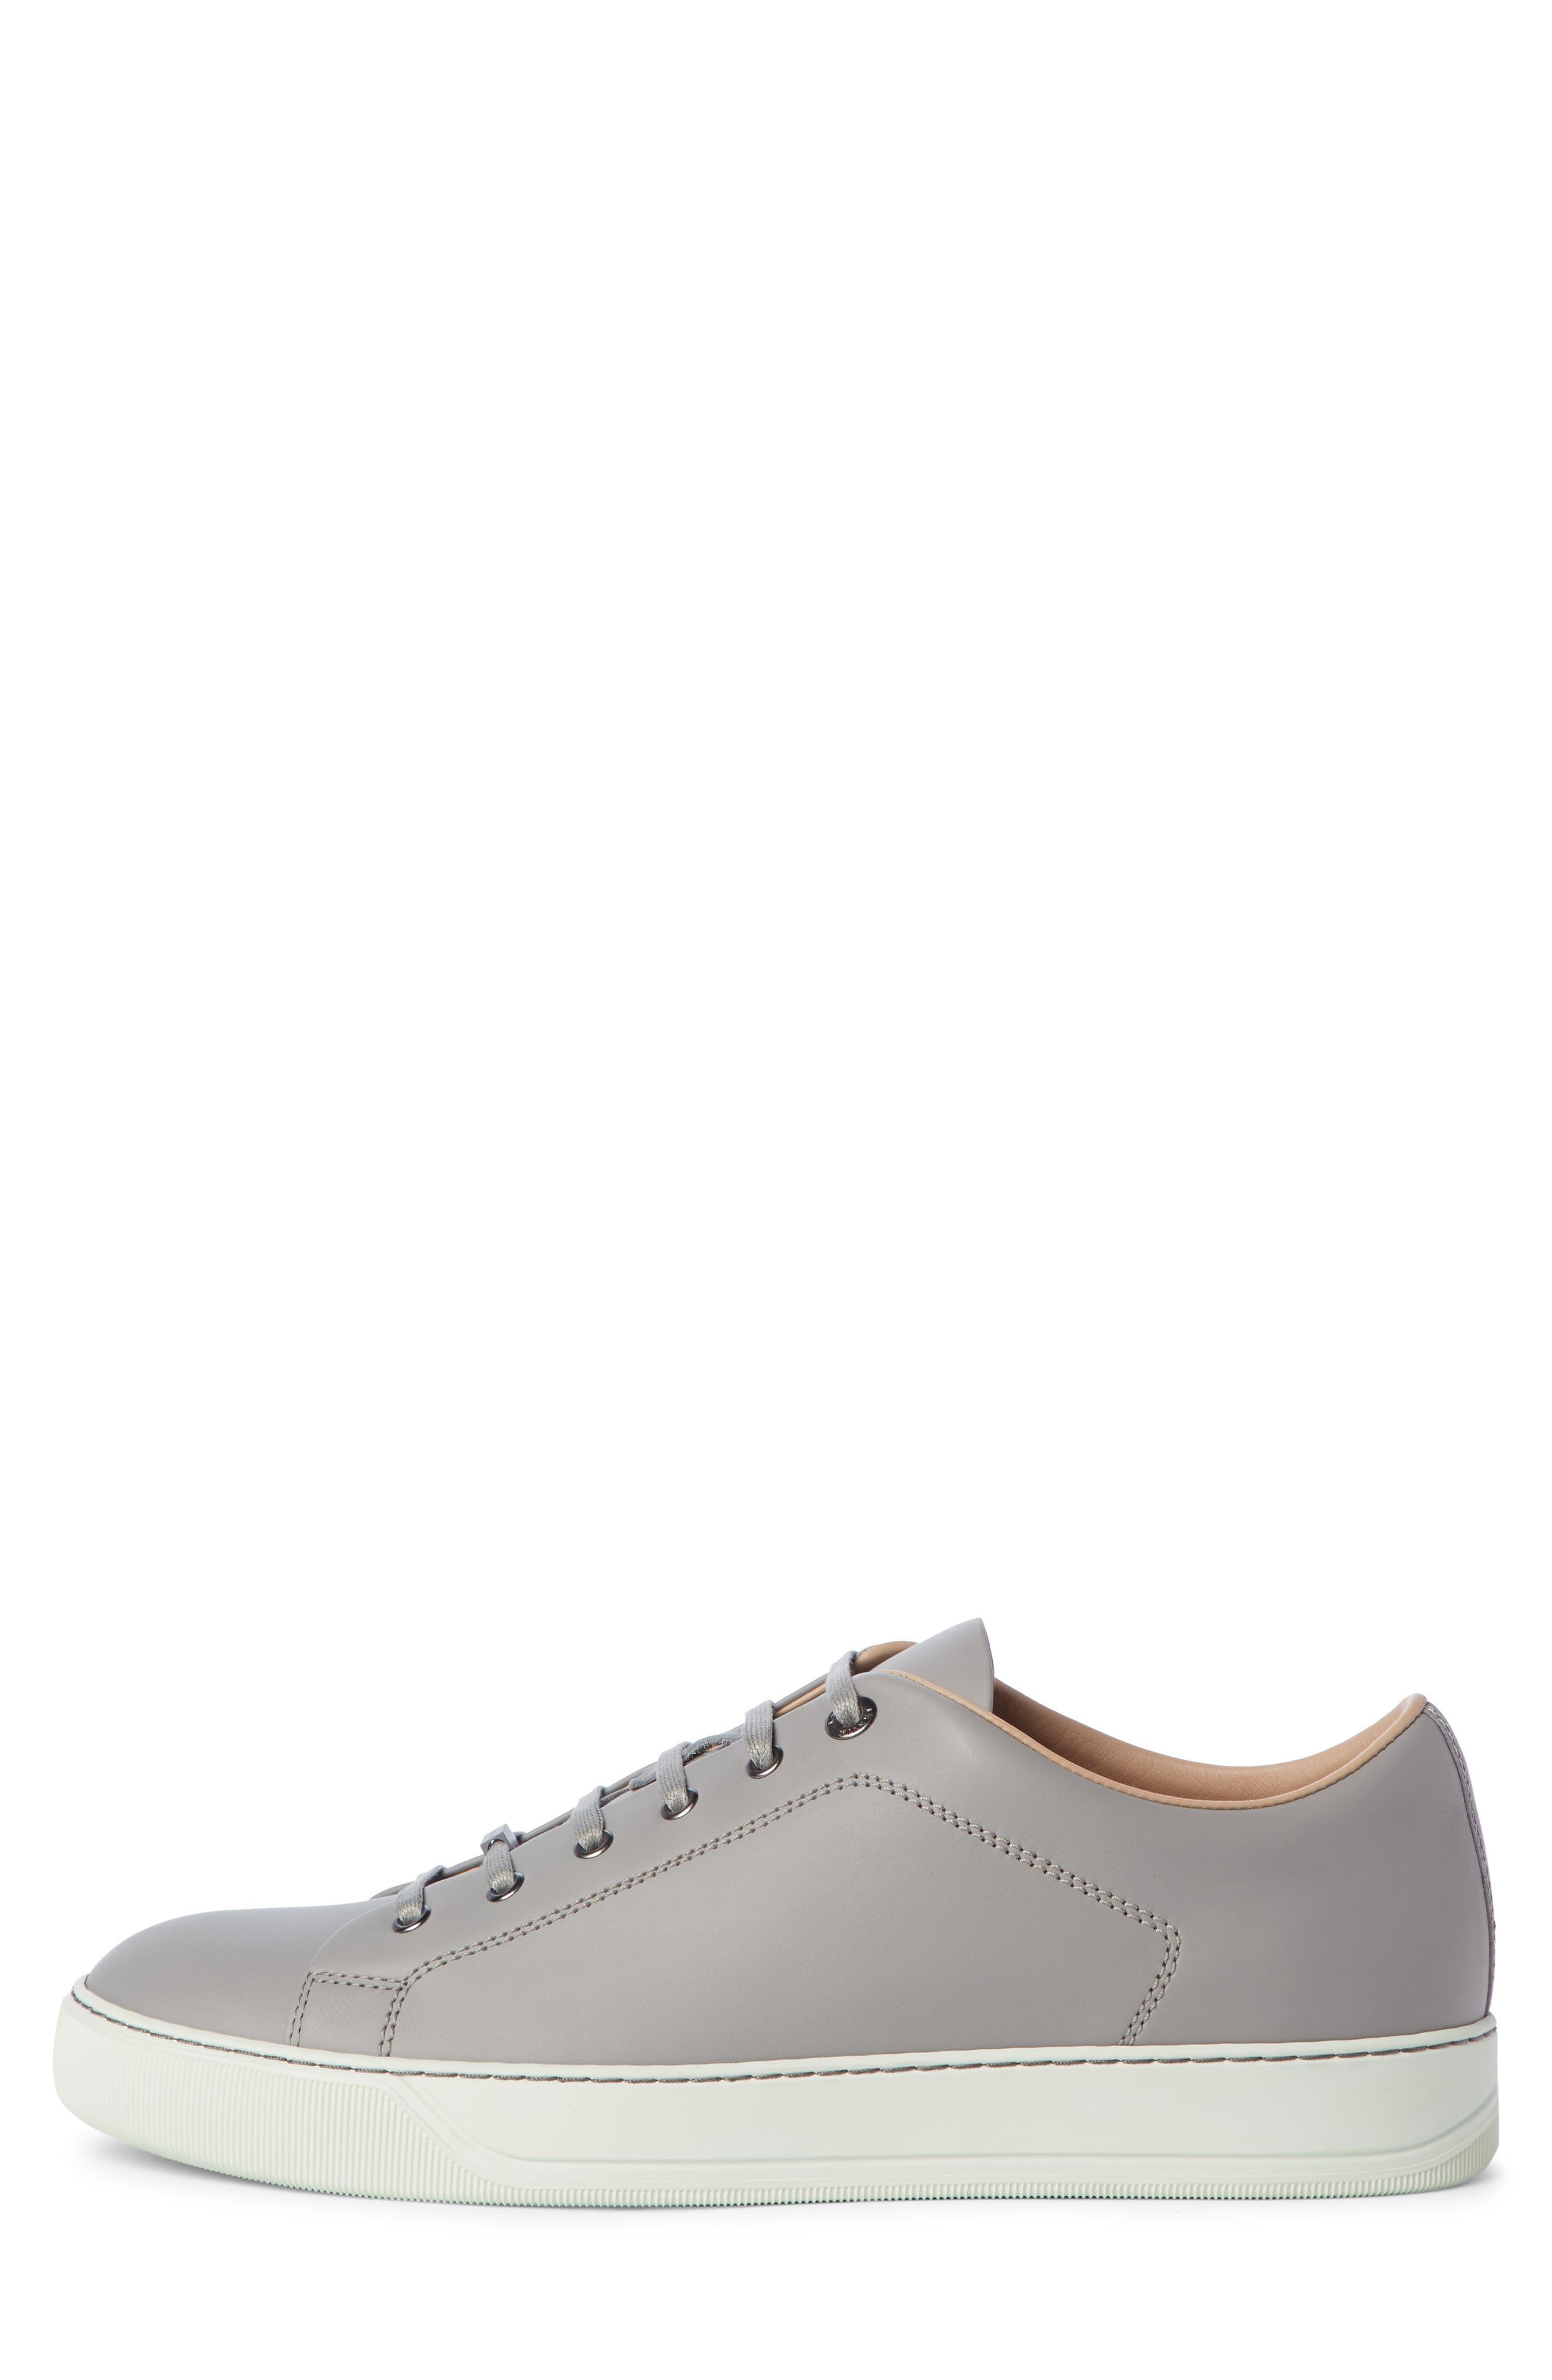 Frye Nappa Sneaker,                             Alternate thumbnail 3, color,                             022